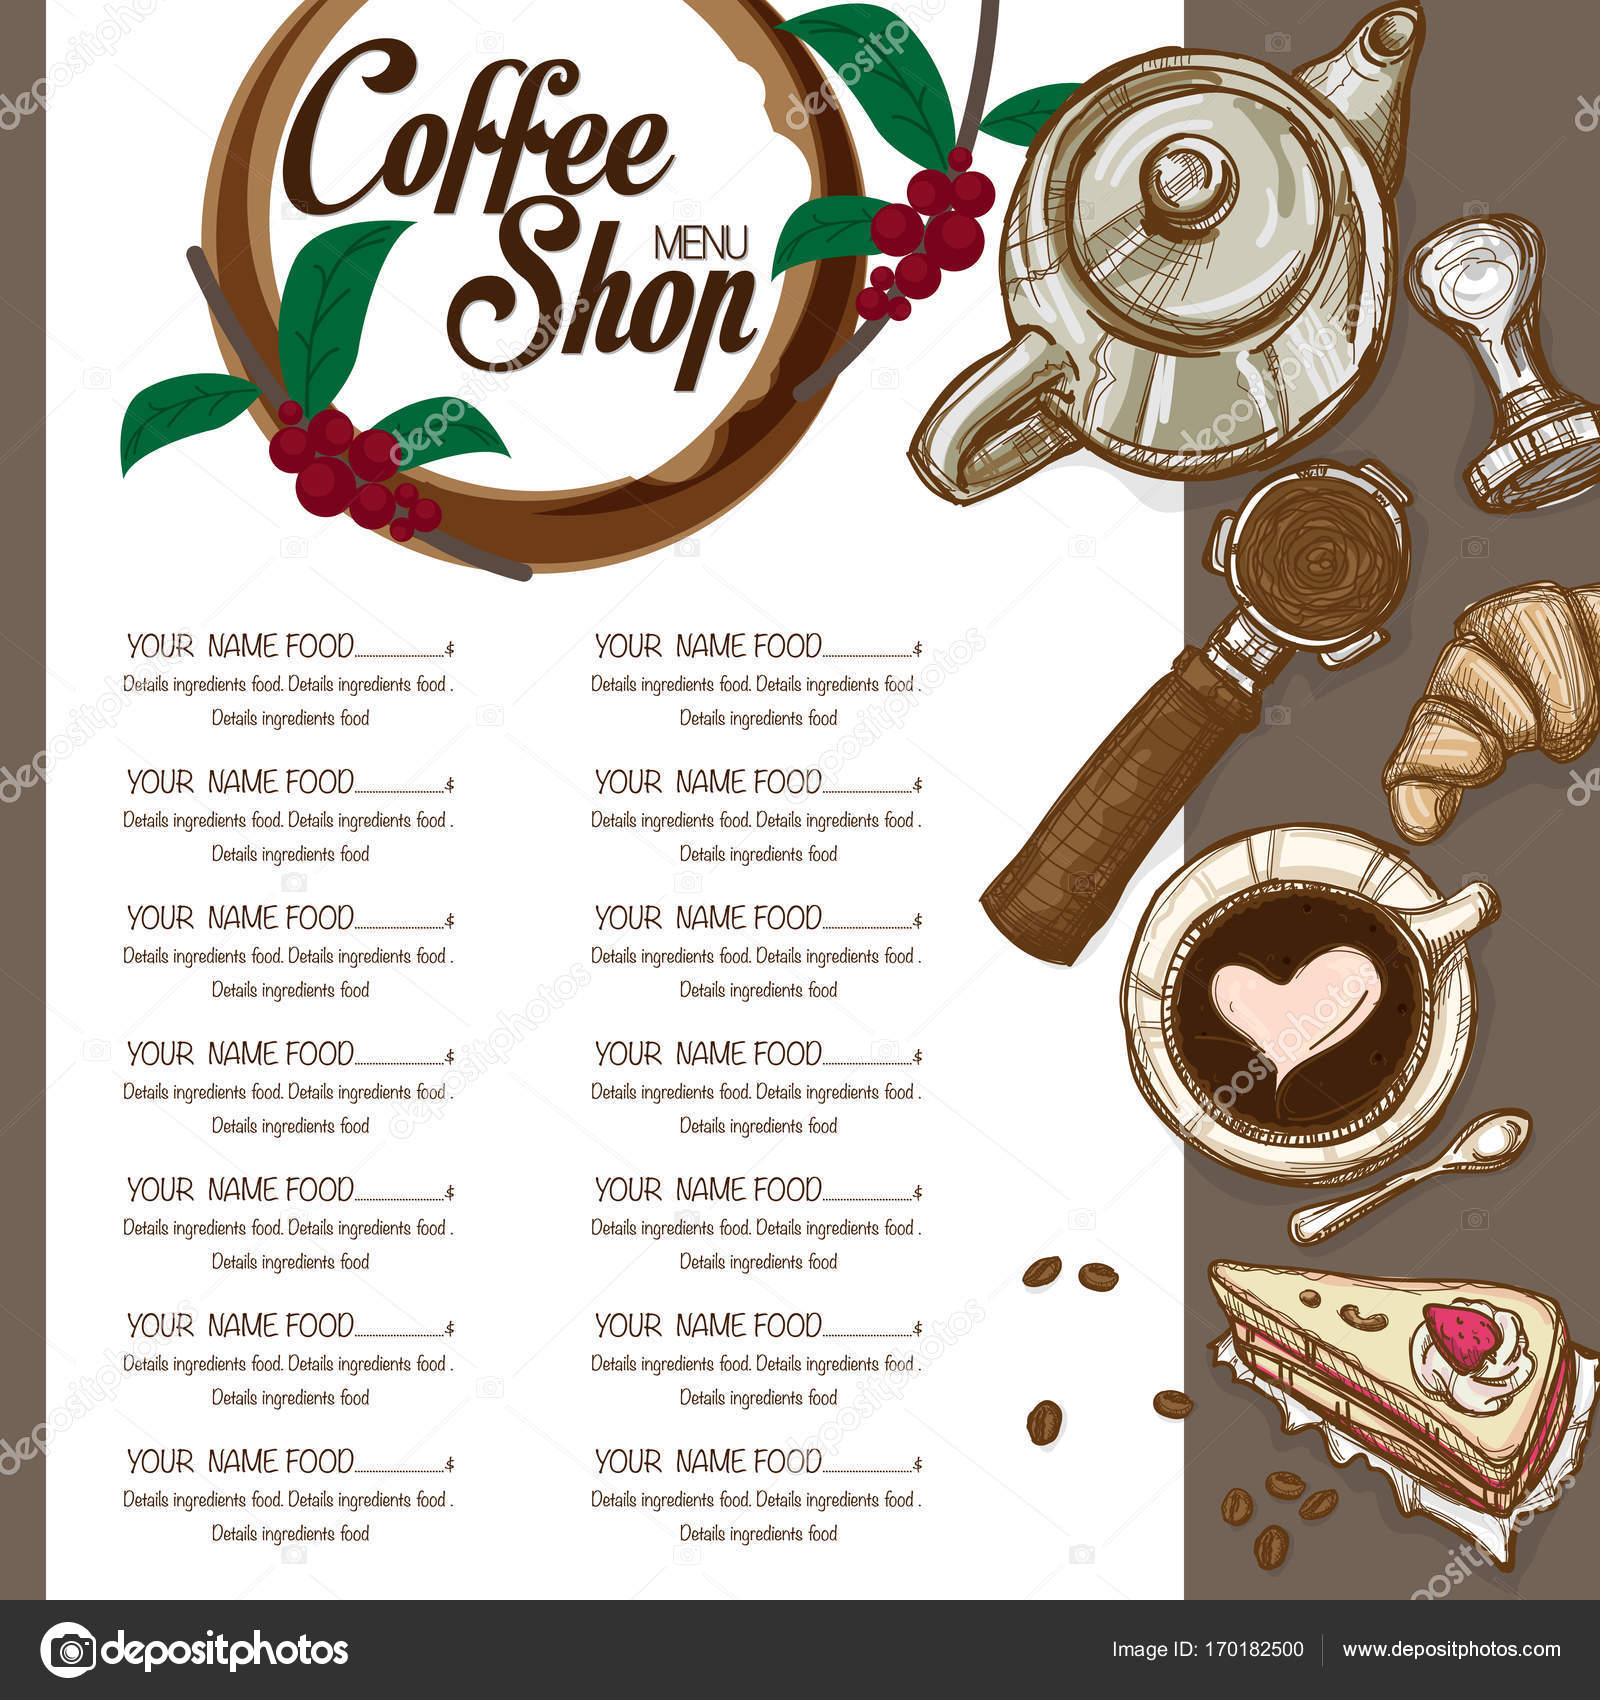 fish and chip shop menu template - menu design shop exaple resume and